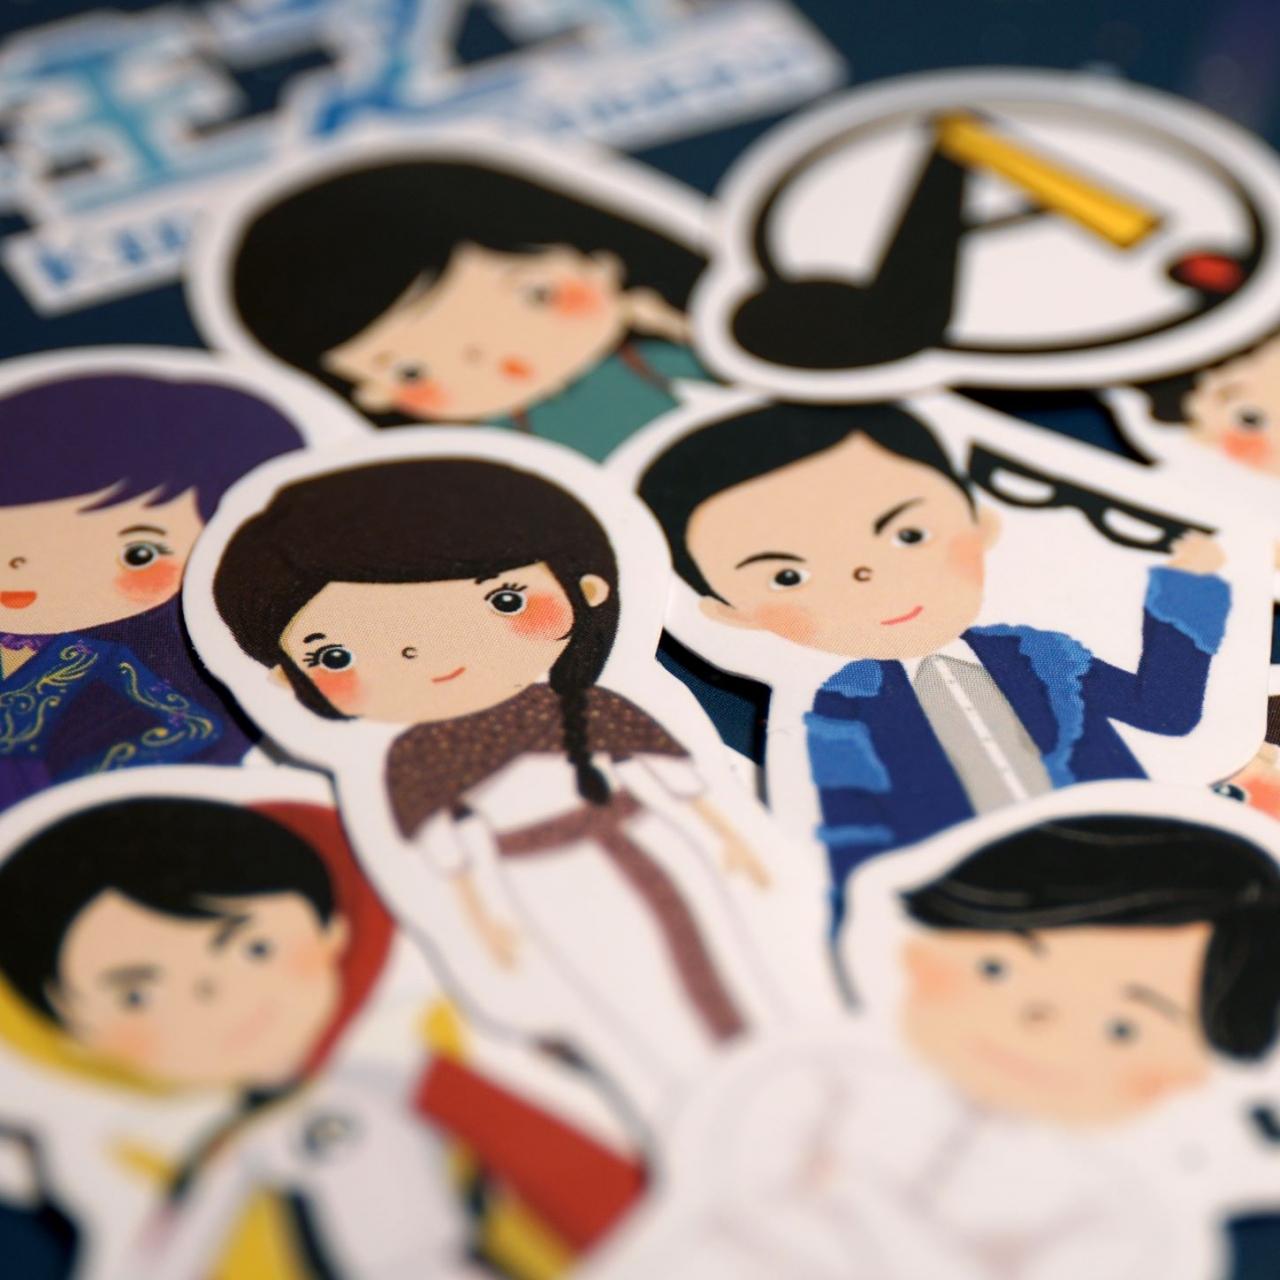 King of Singers Cartoon Stickers